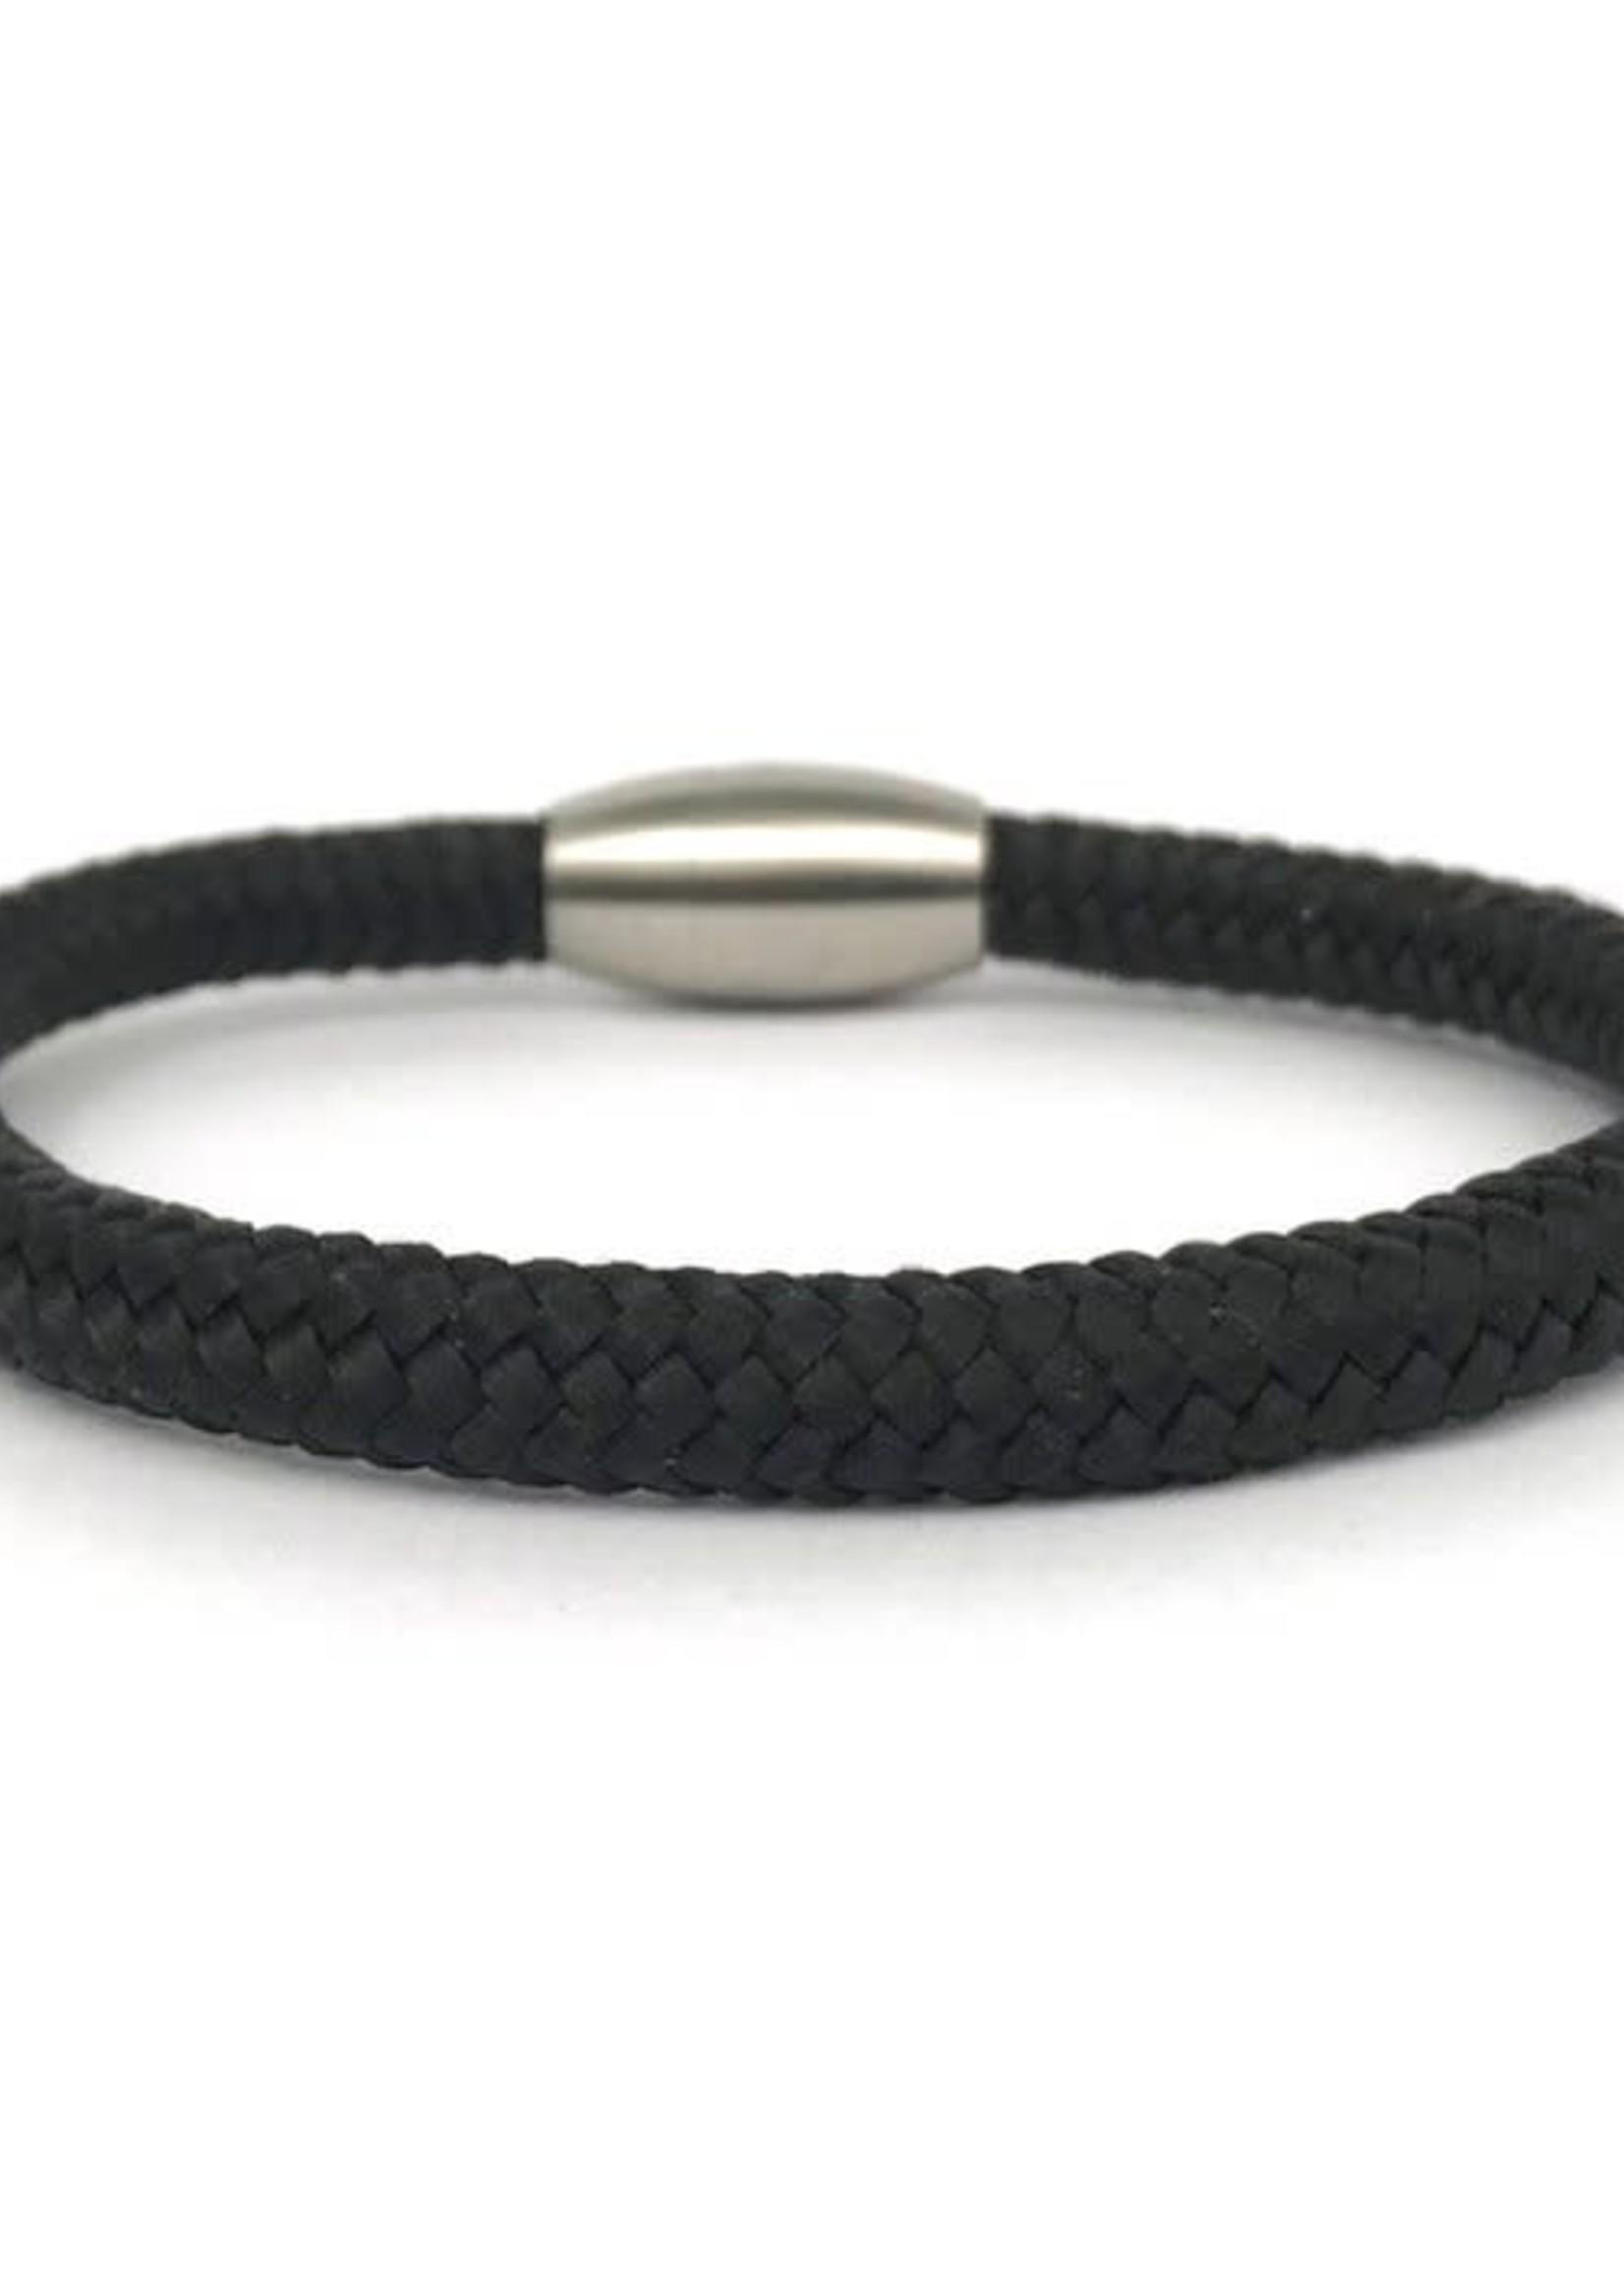 By Julian By Julian- armband Laut zwart (100% gerecycled koord) XL (20cm)